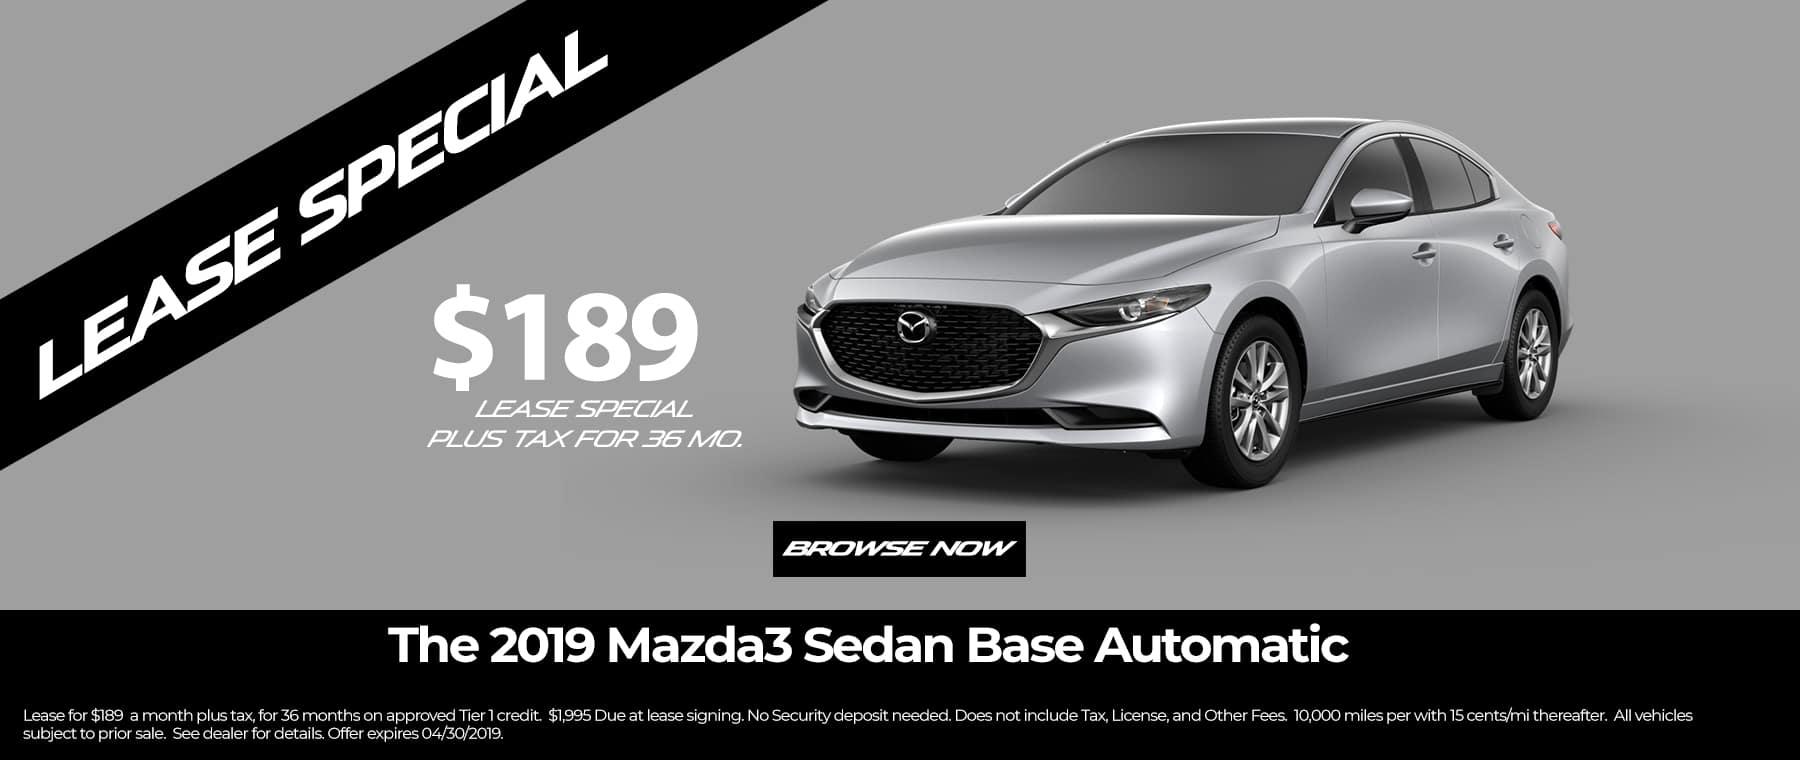 Mazda 3 Sedan Lease